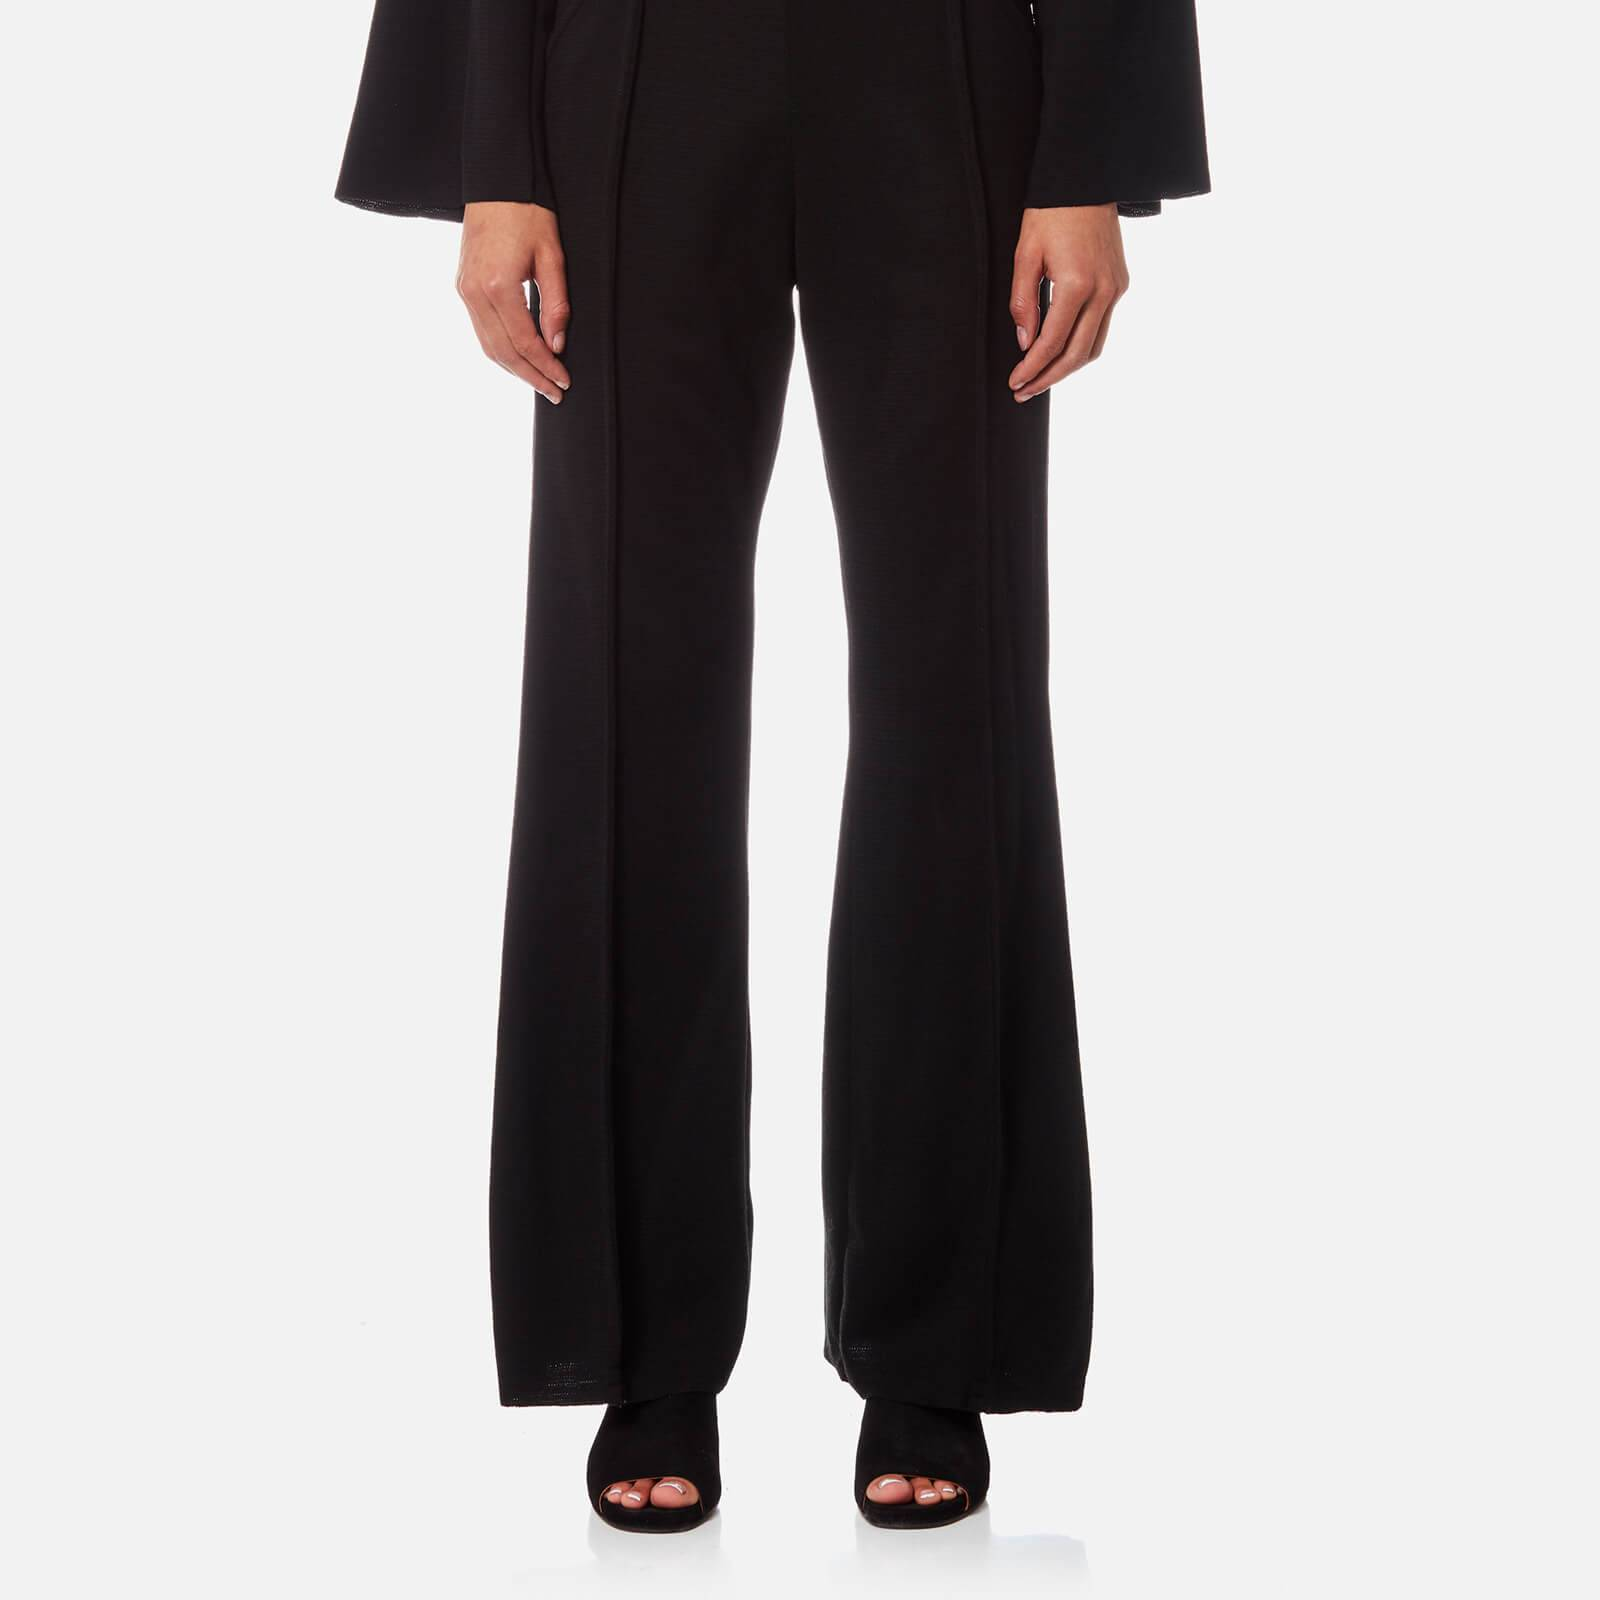 House of Sunny Women's Maxim Wide Legged Trousers - Supa Black - UK 8 - Black